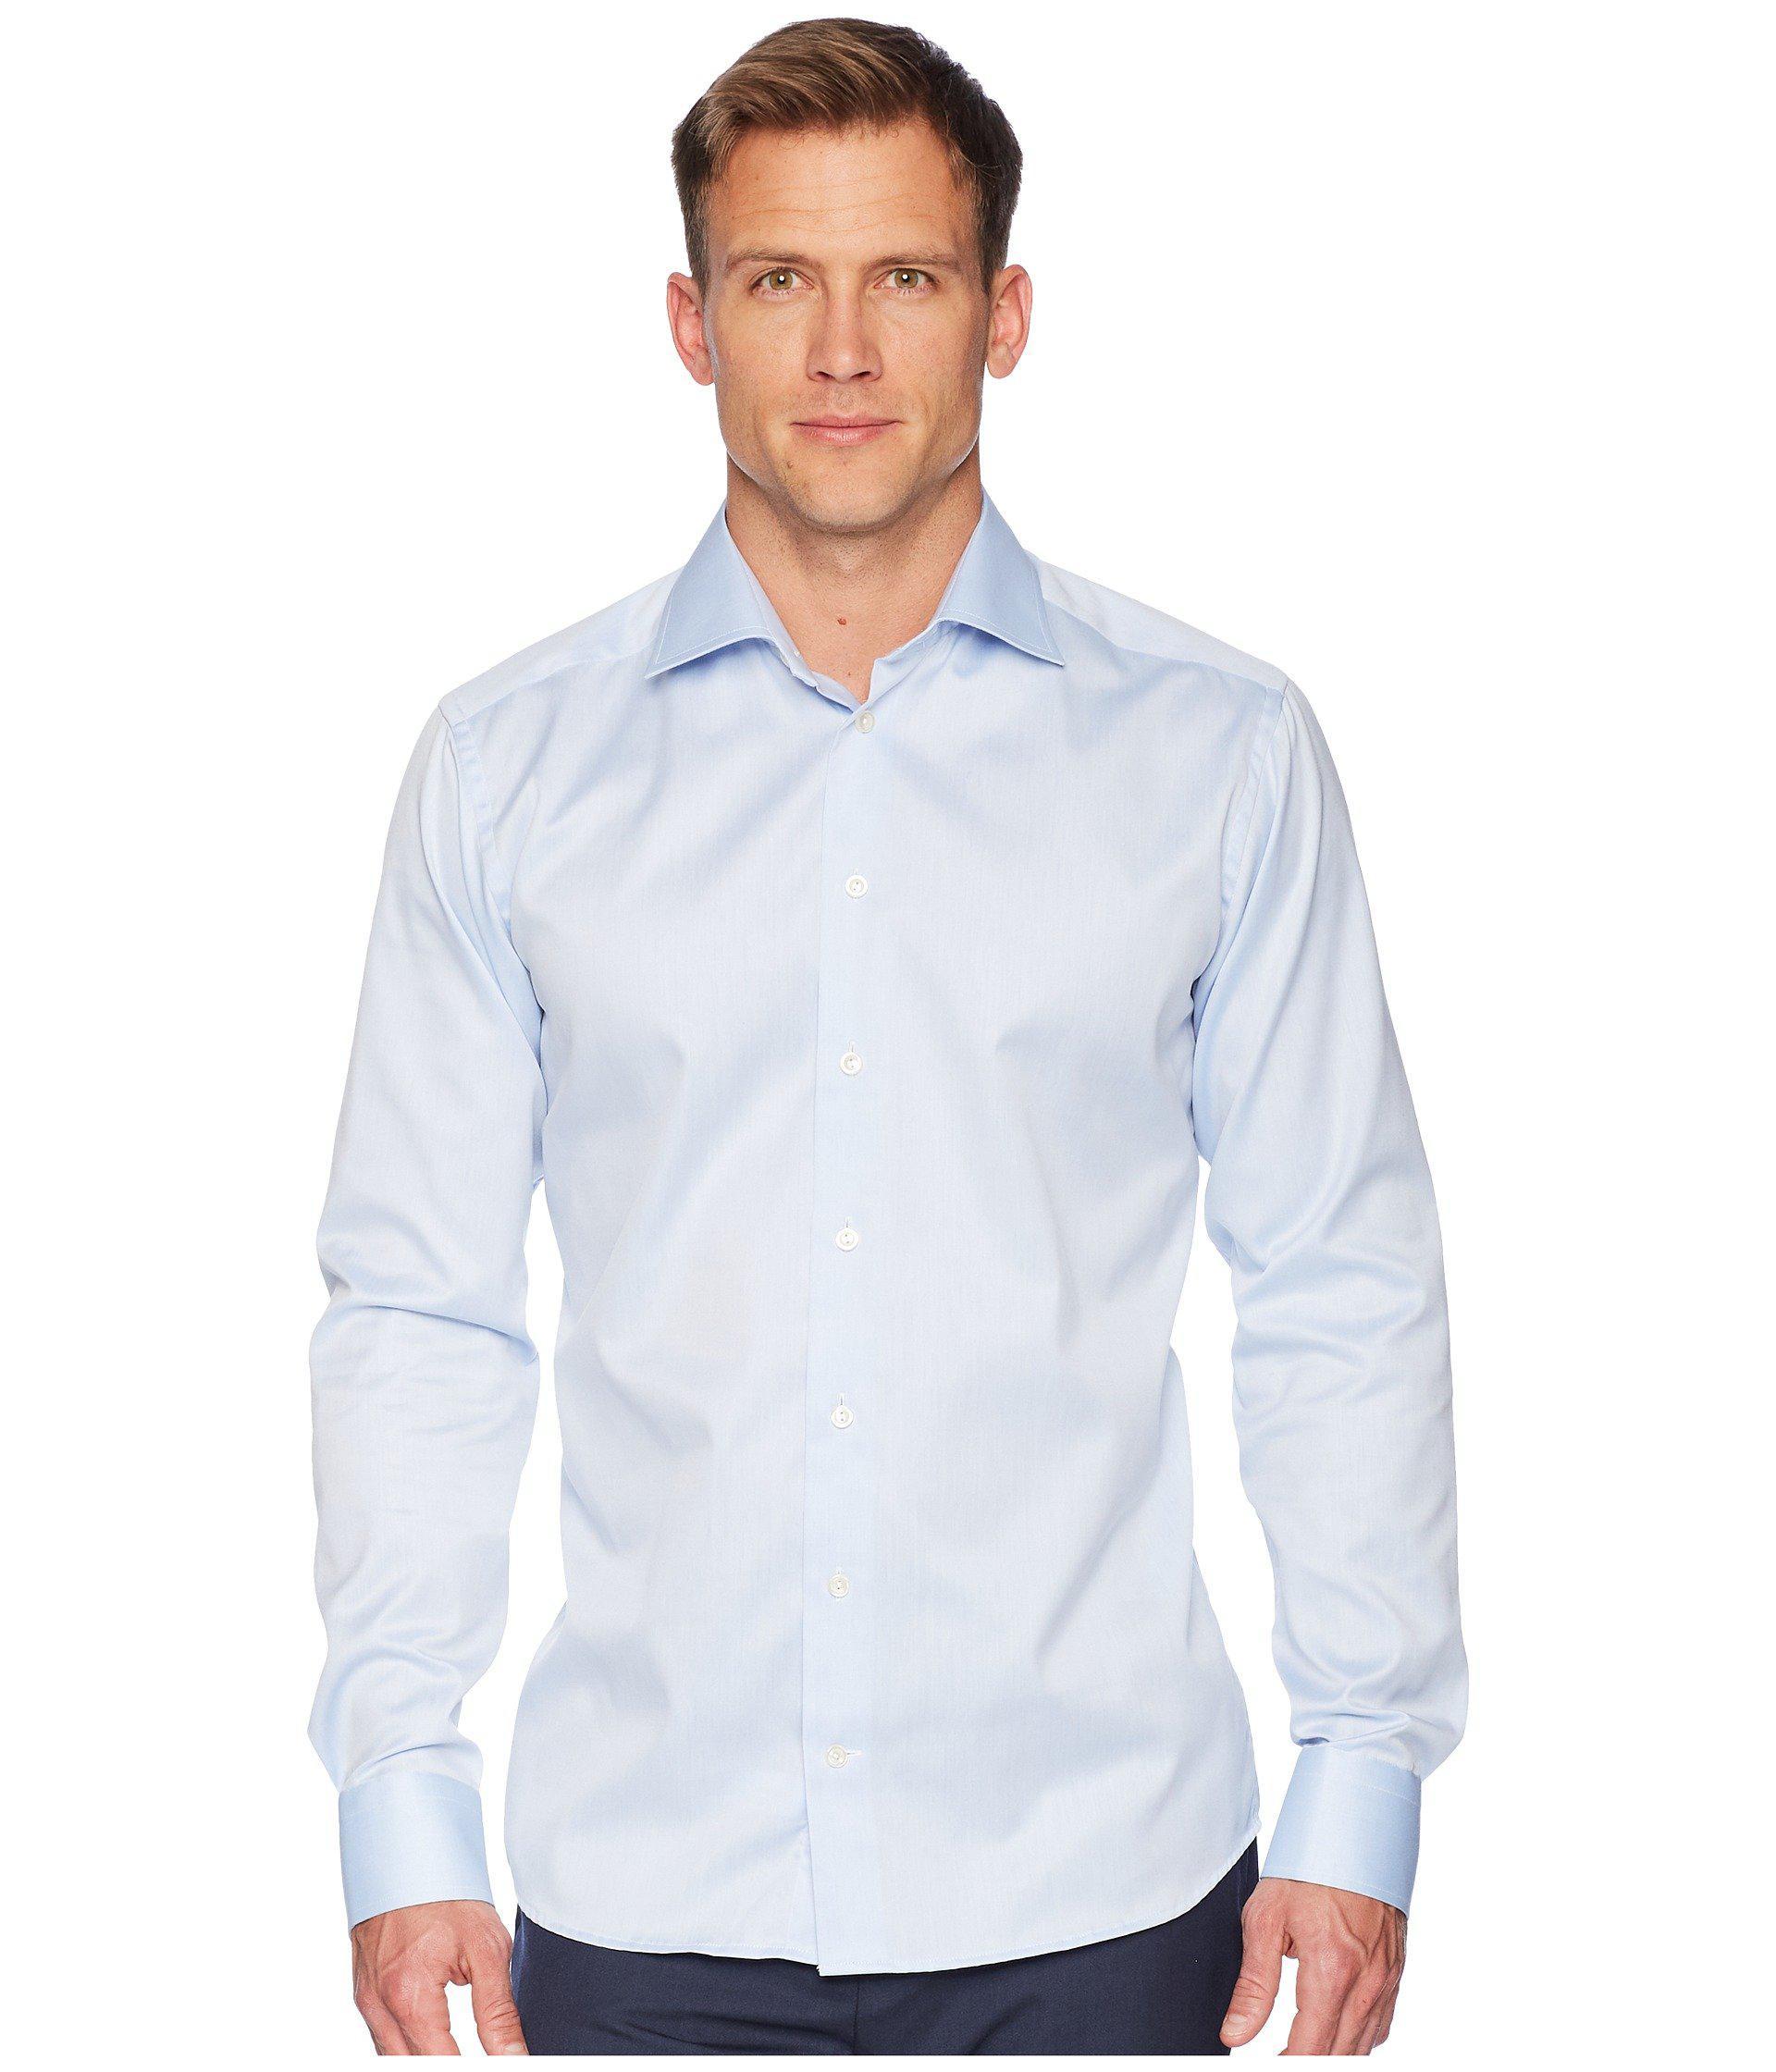 a38de9813e0 Lyst - Eton of Sweden Slim Fit Twill Shirt (white) Men s Clothing in ...